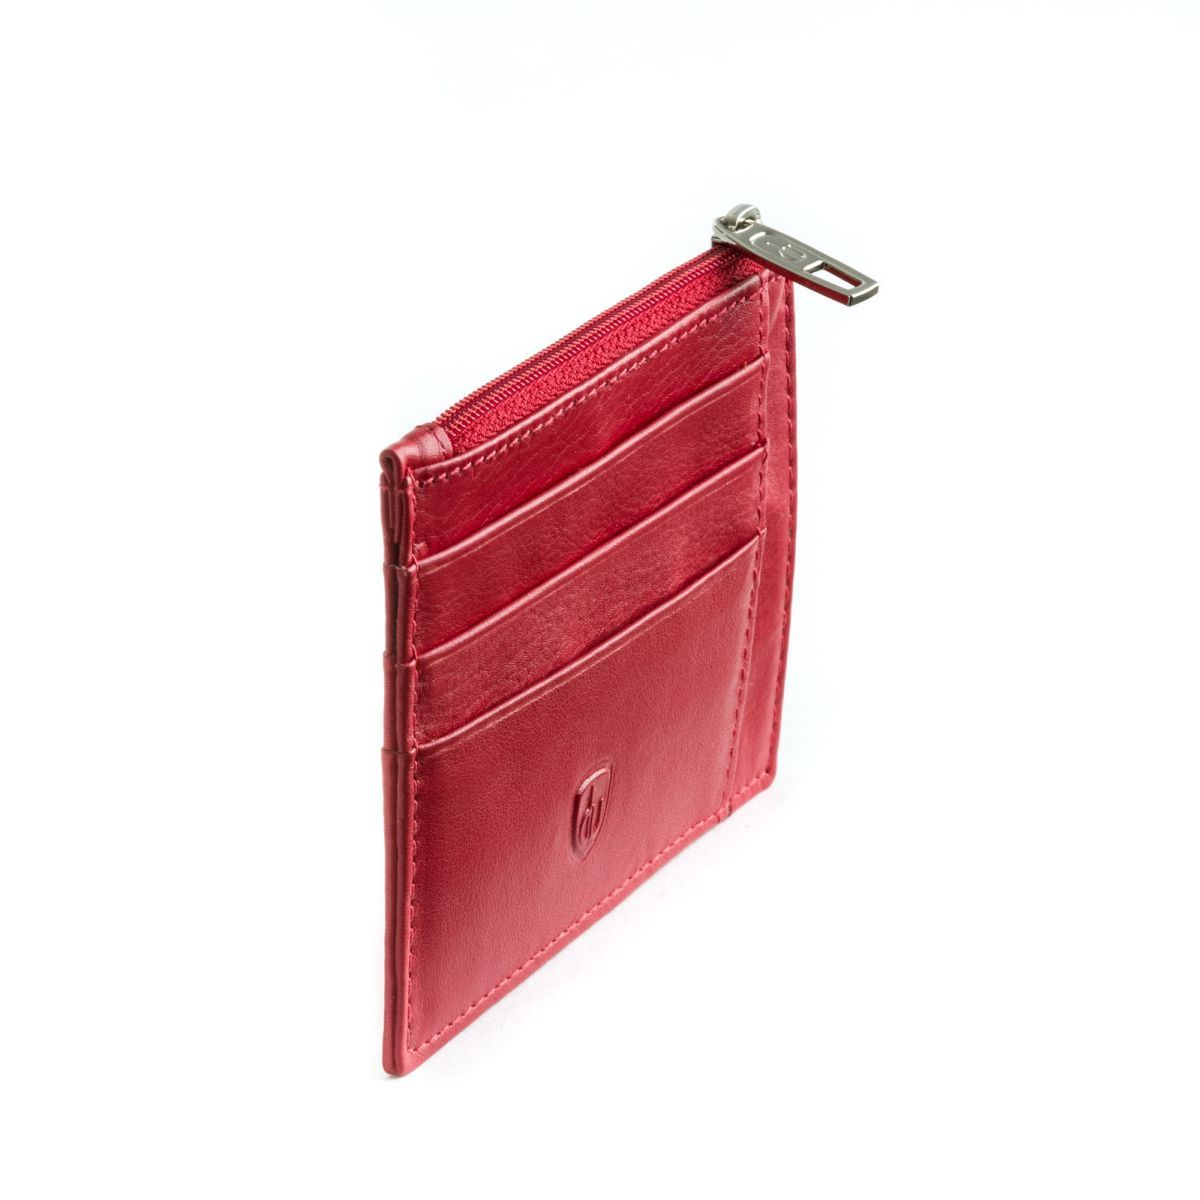 dv ארנק מינימלסטי עם תא למטבעות - אדום